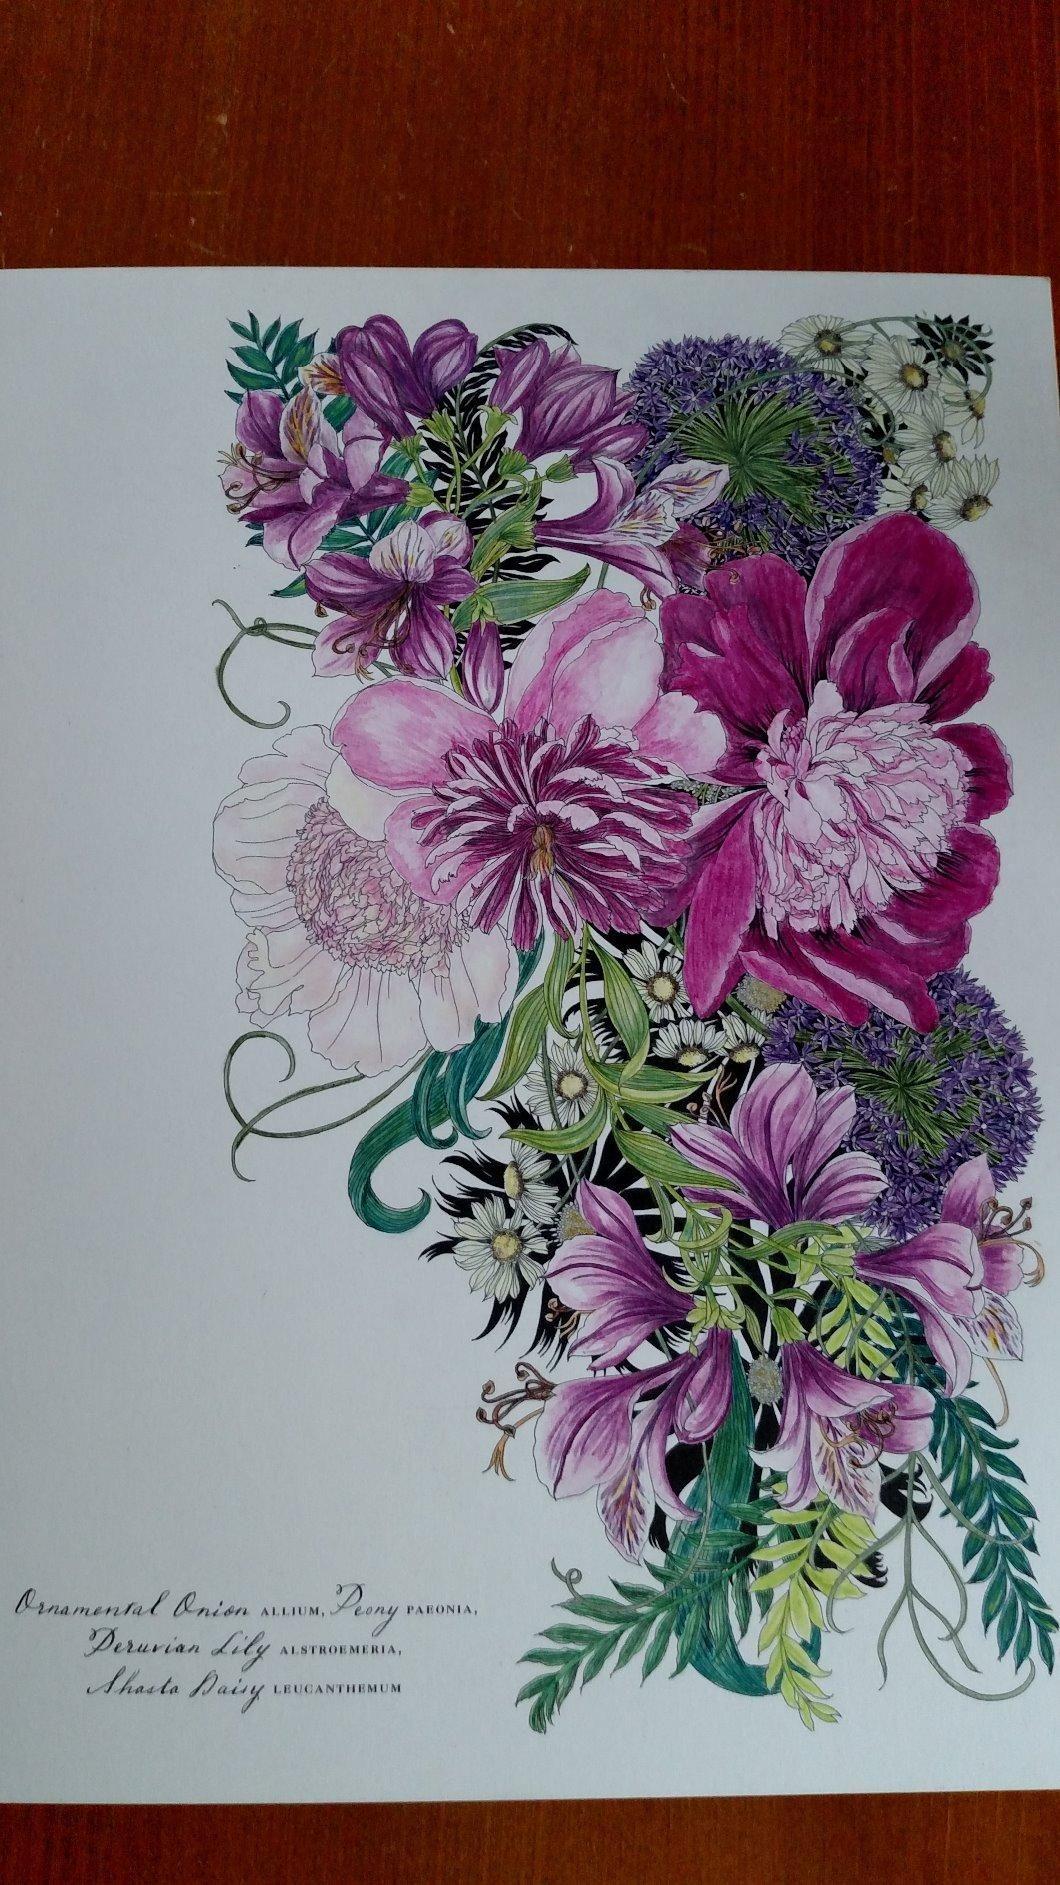 Https Www Amazon Com Floribunda Flower Coloring Leila Duly Dp 1780677685 Ref La B01i2lflwk 1 1 Flower Drawing Colored Pencil Coloring Book Coloring Book Art